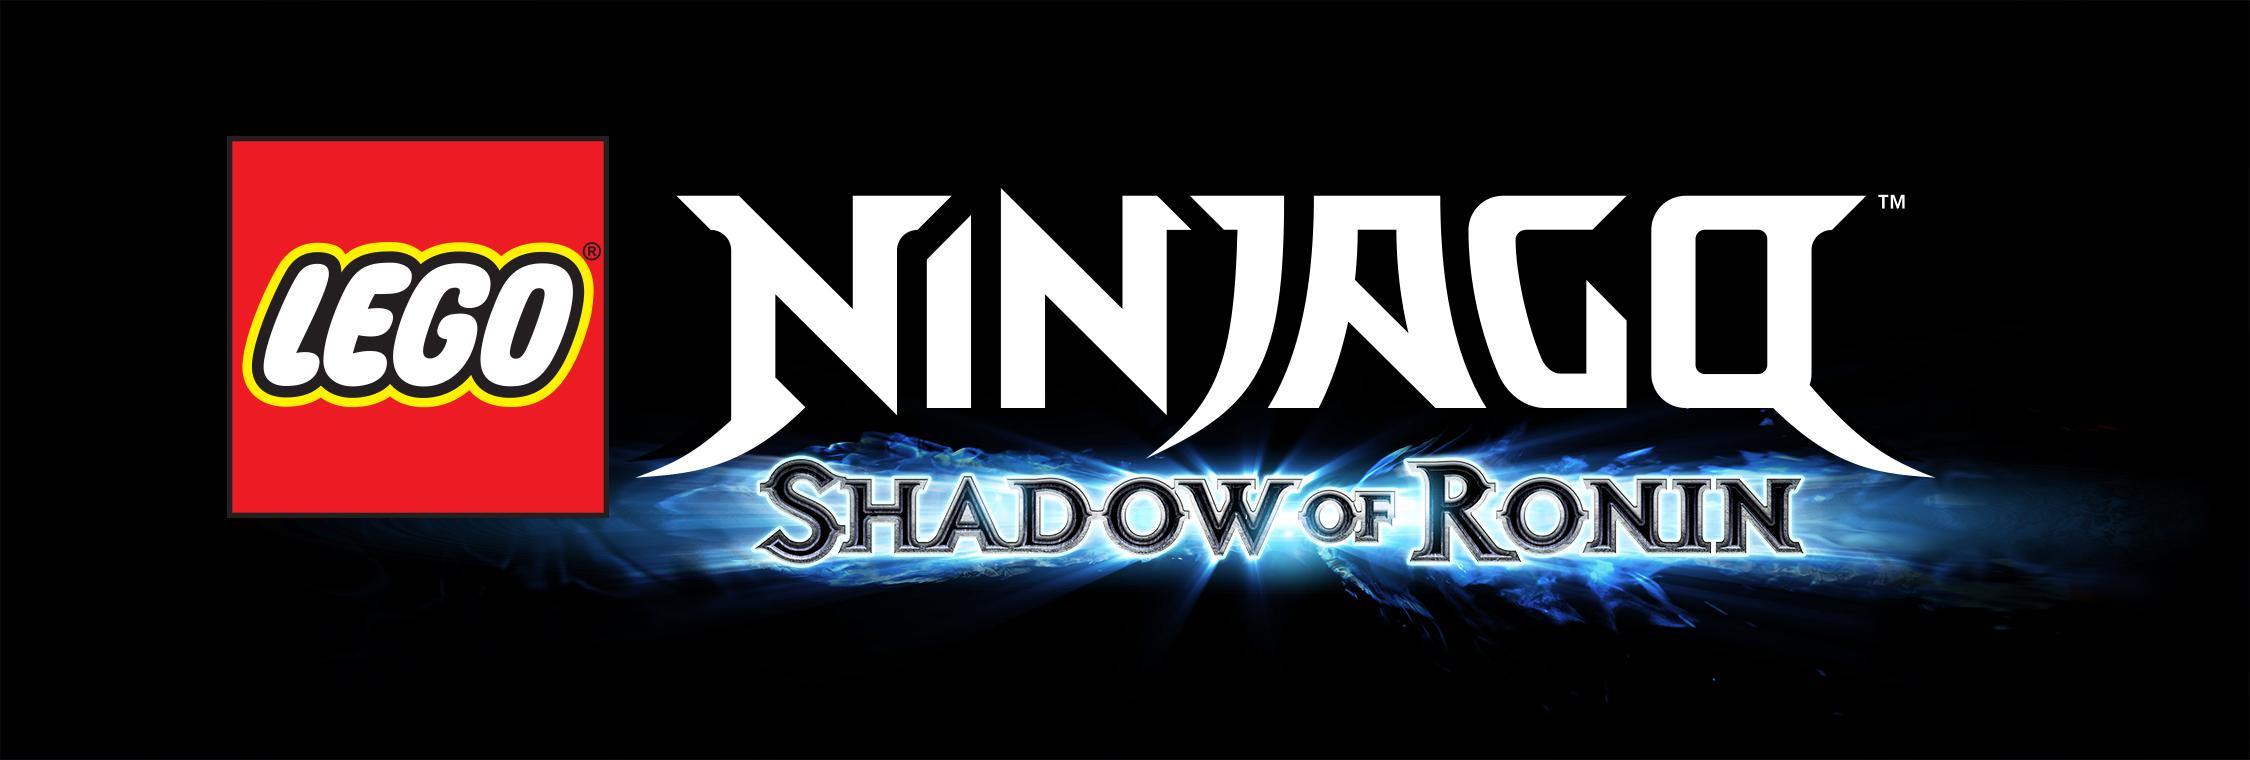 Ninjago Logos